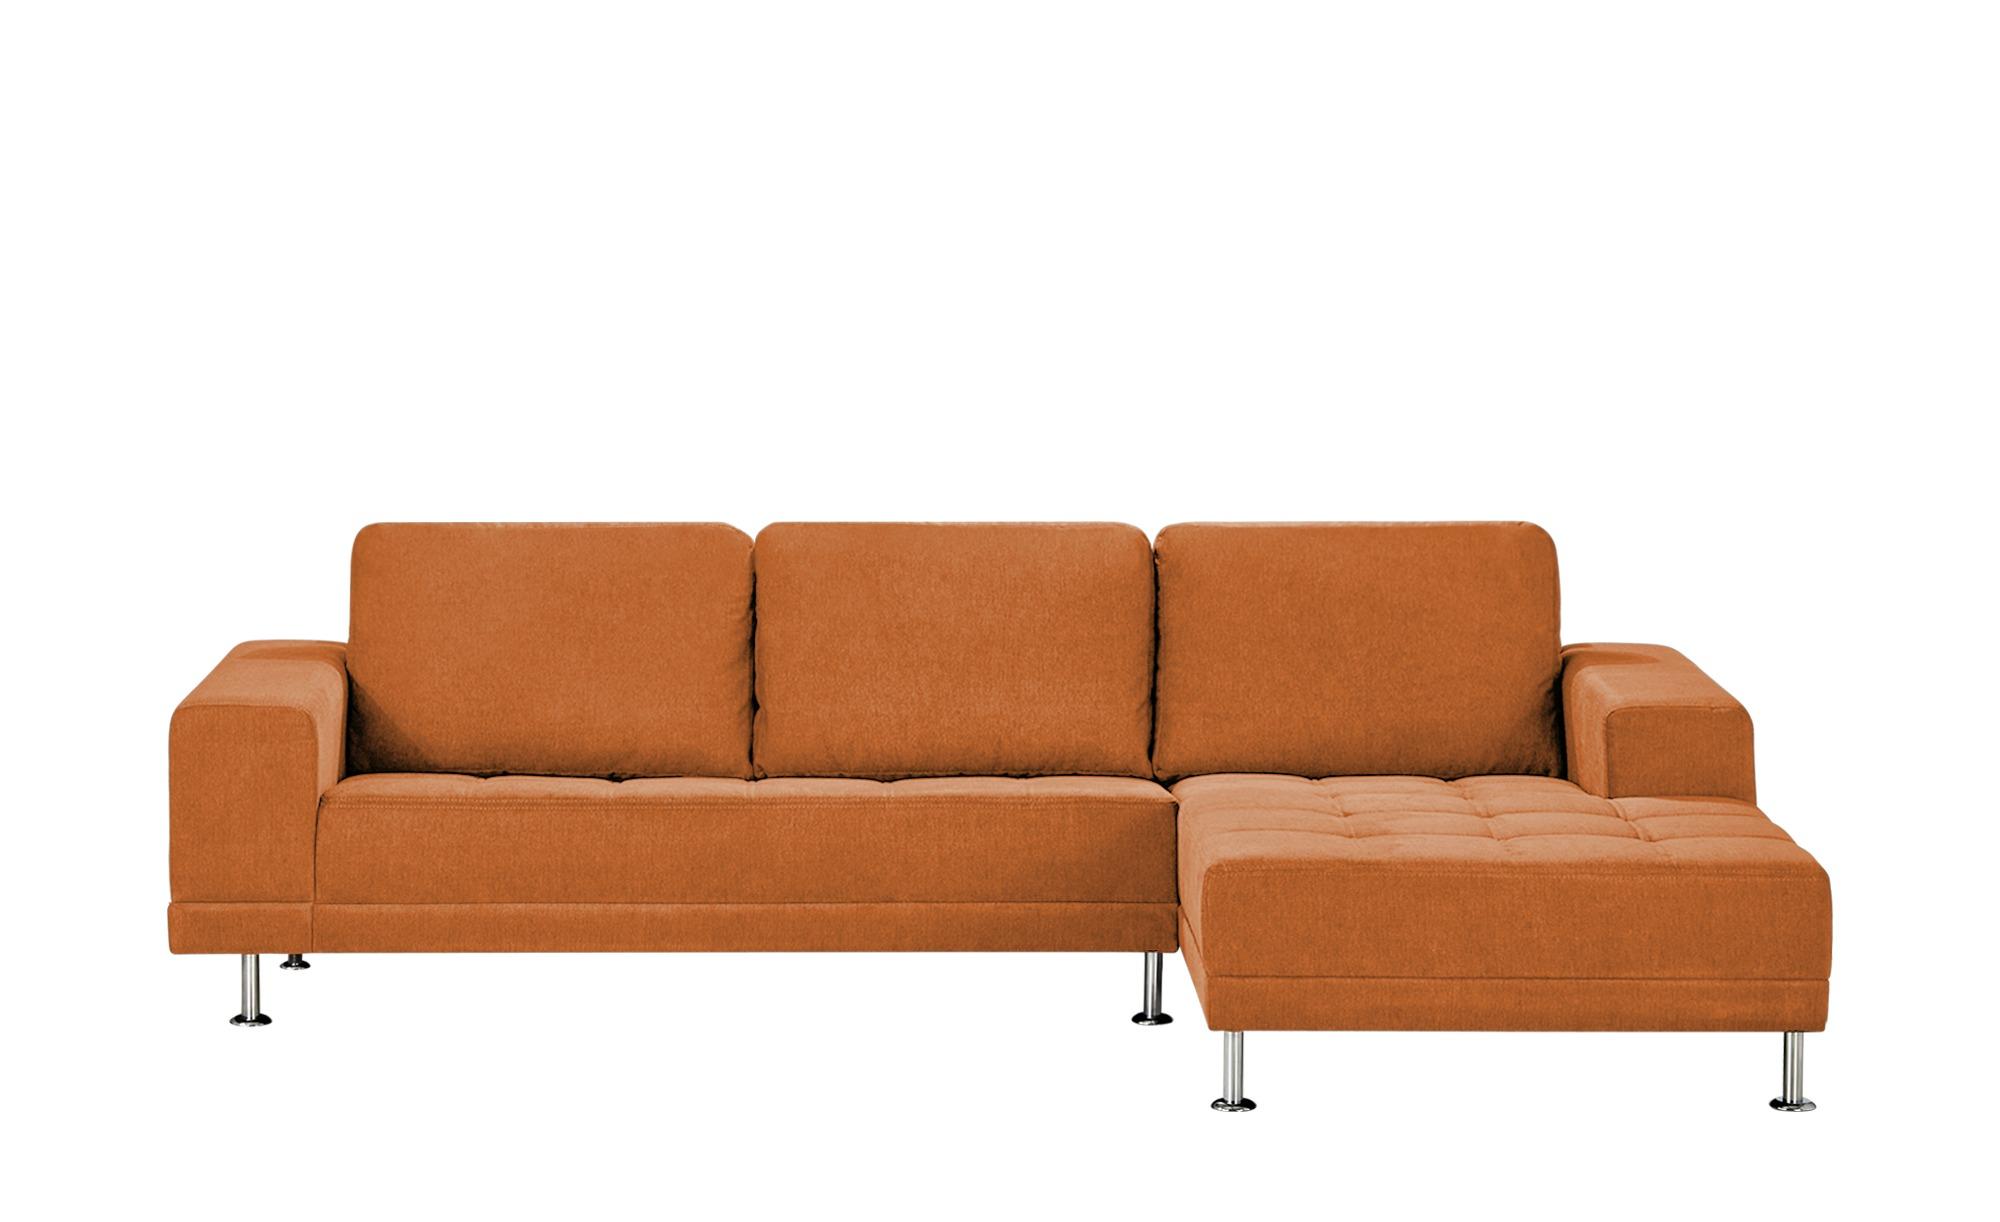 Smart Ecksofa Garda Gefunden Bei Mobel Hoffner Ecksofa Sofa Sofa Leder